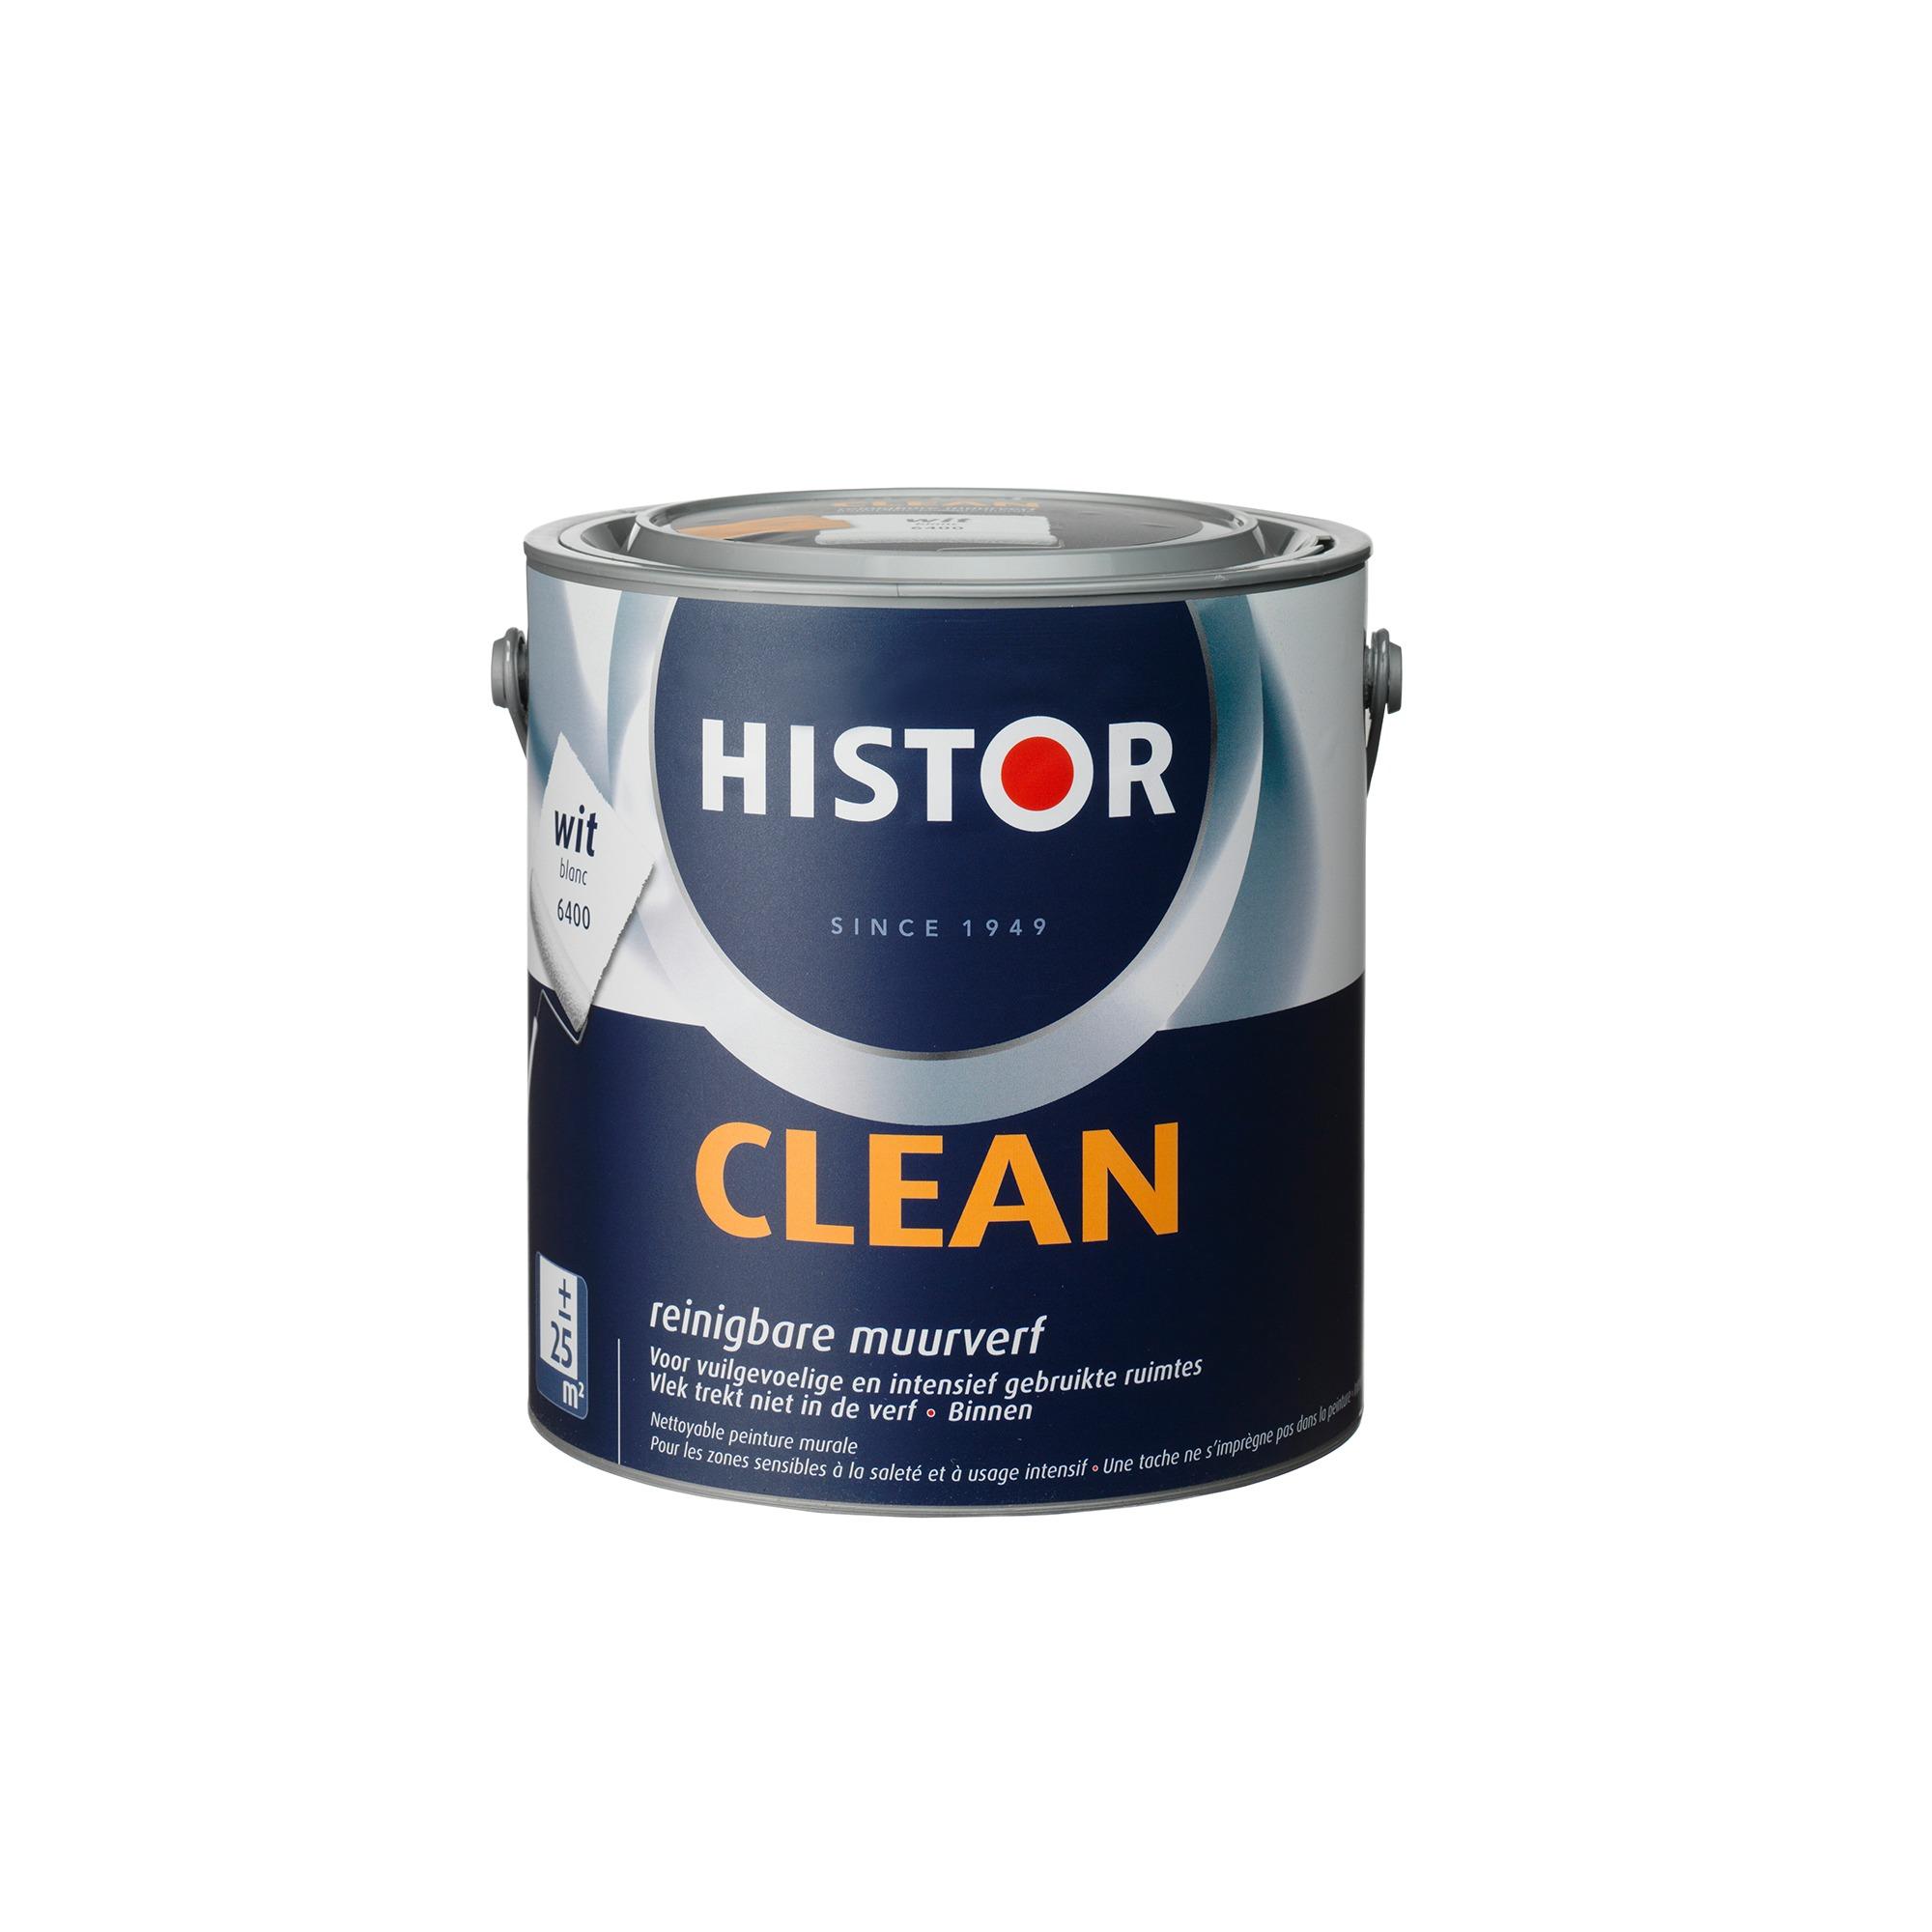 Histor Clean Muurverf Wit 2,5 l